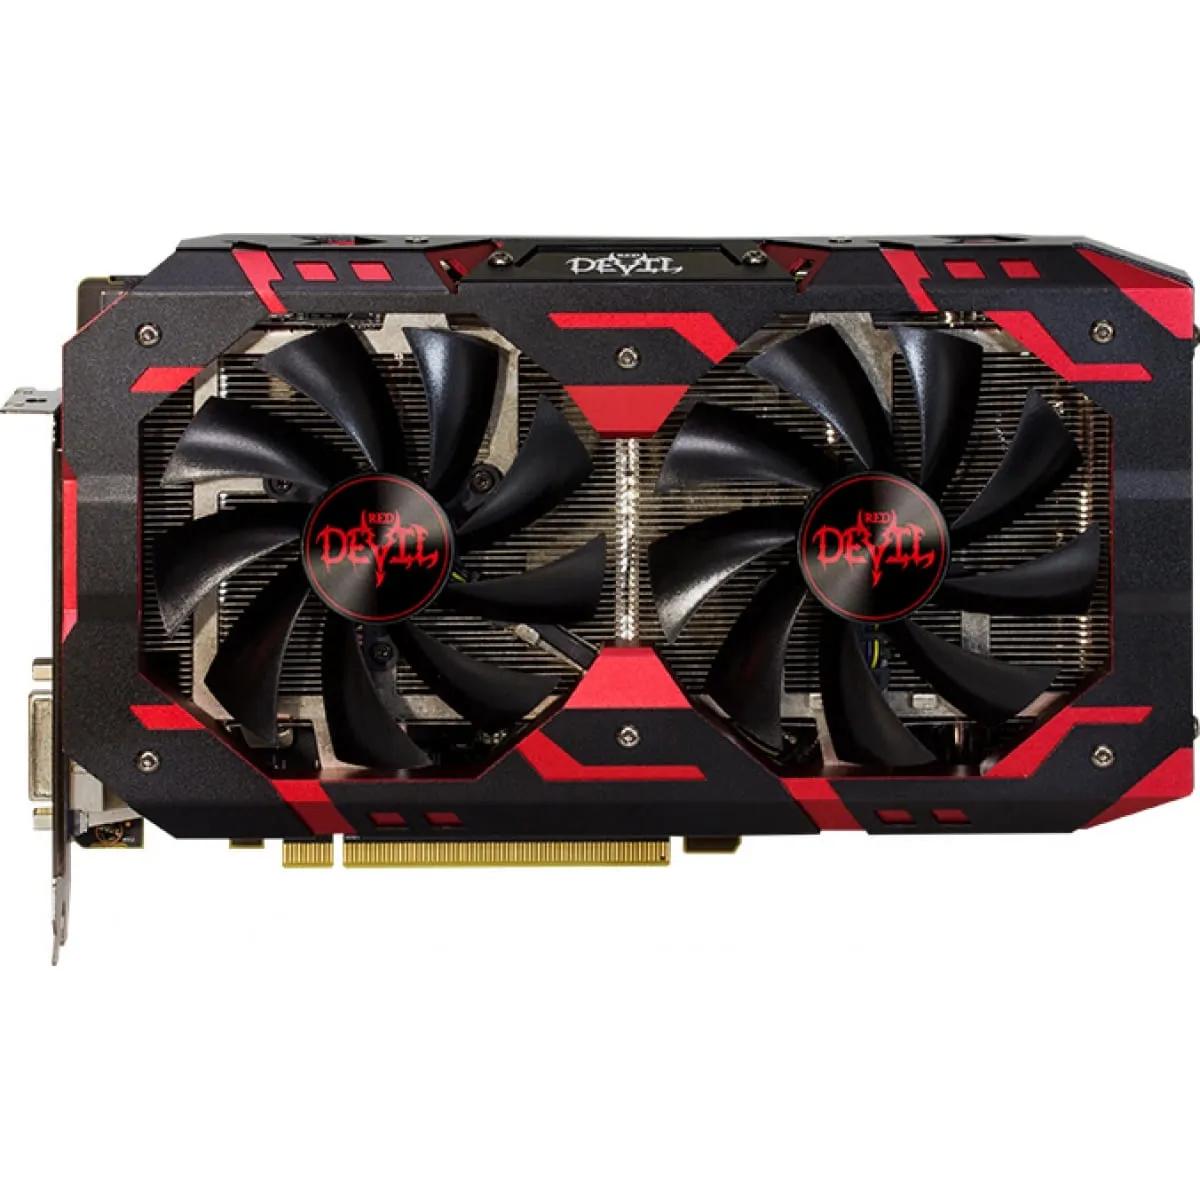 Placa de Vídeo Power Color Radeon RX 580 Red Devil Dual 8GB GDDR5 256Bit AXRX 580 8GBD5-3DH/OC